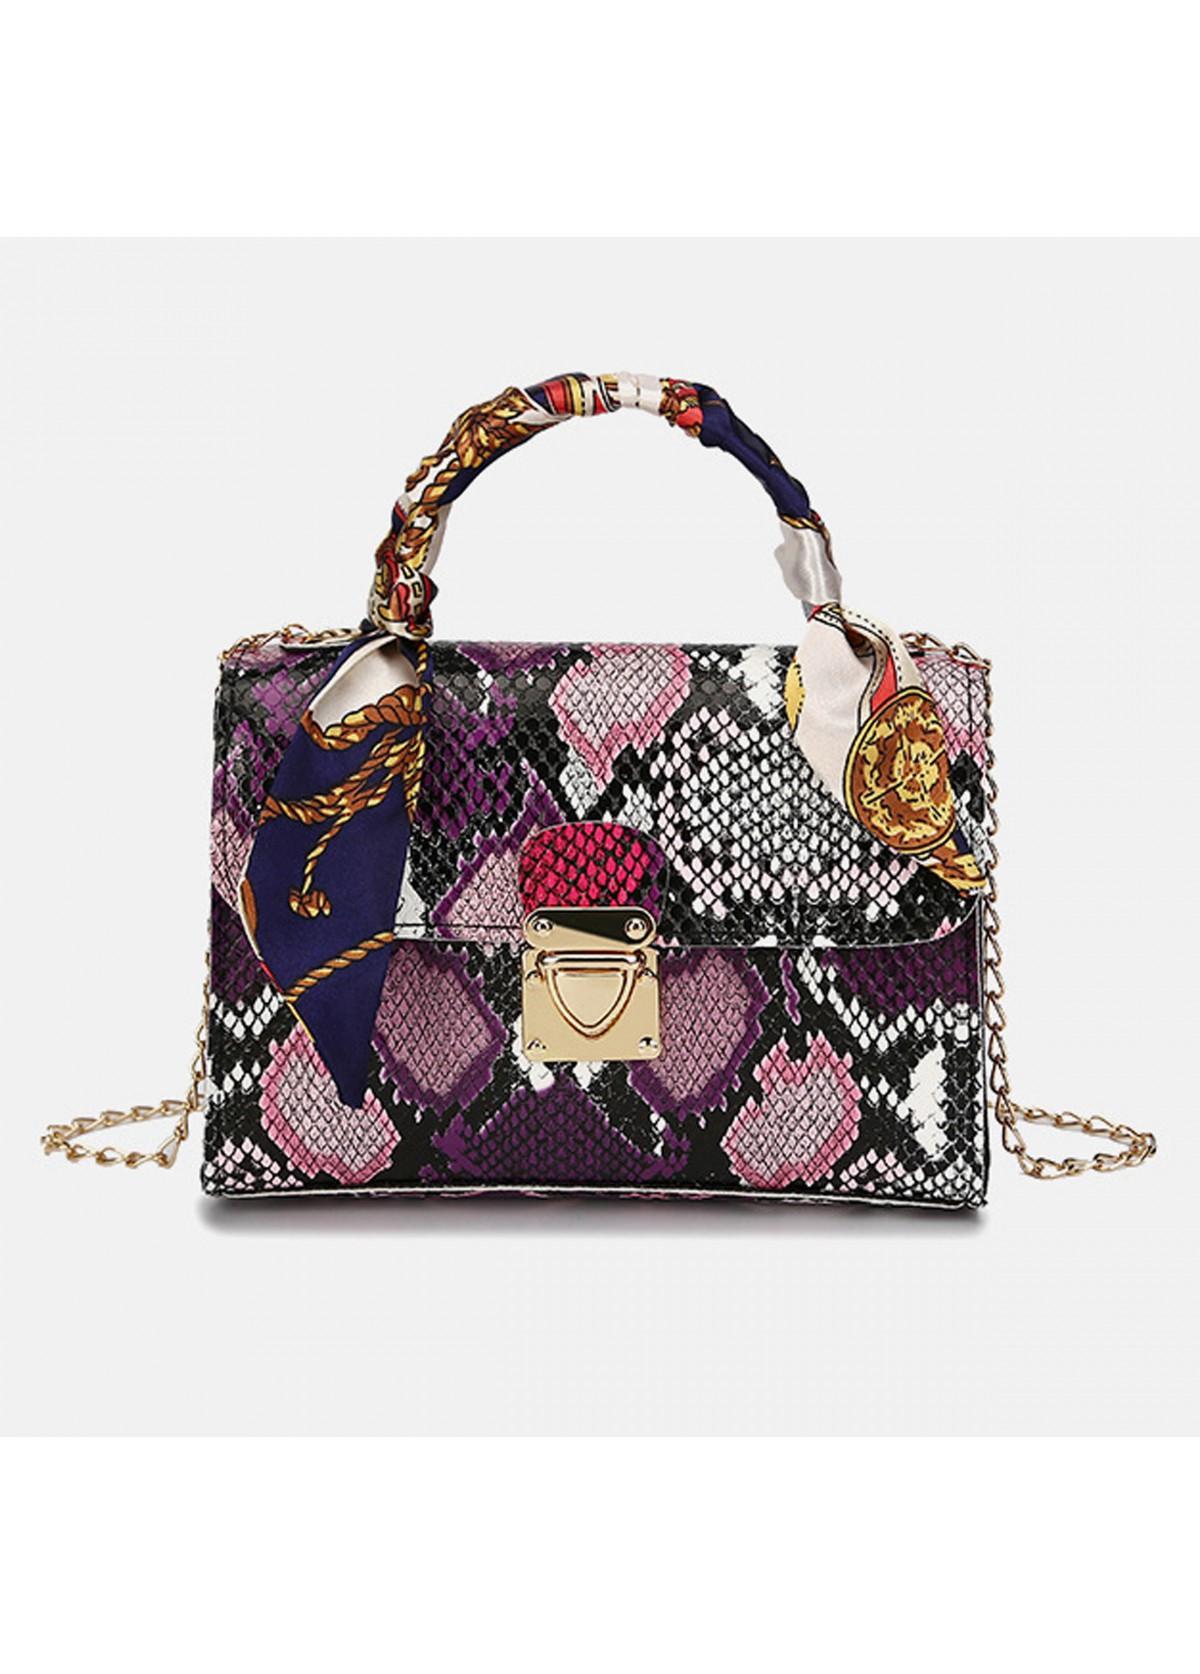 PU Snake Print Gold Chain CrossBody Messenger Bag